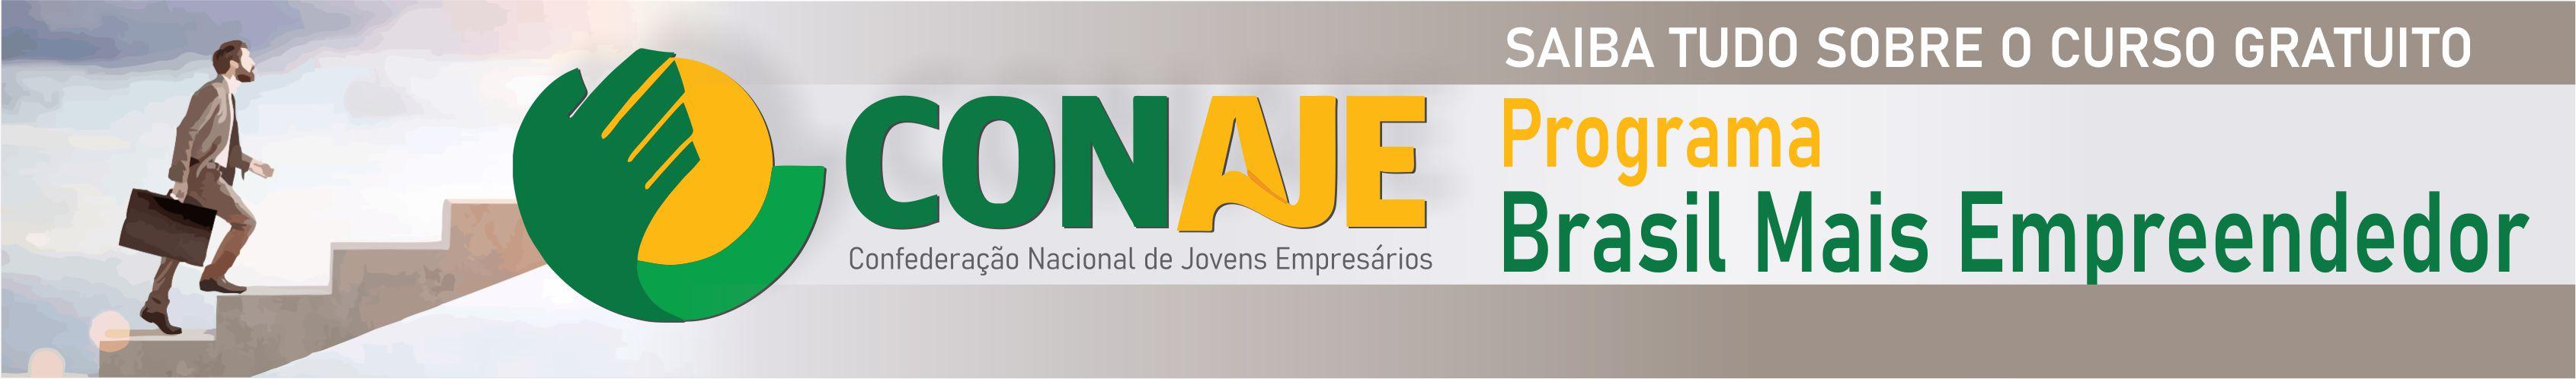 Programa Brasil Mais Empreendedor- CONAJE (2)